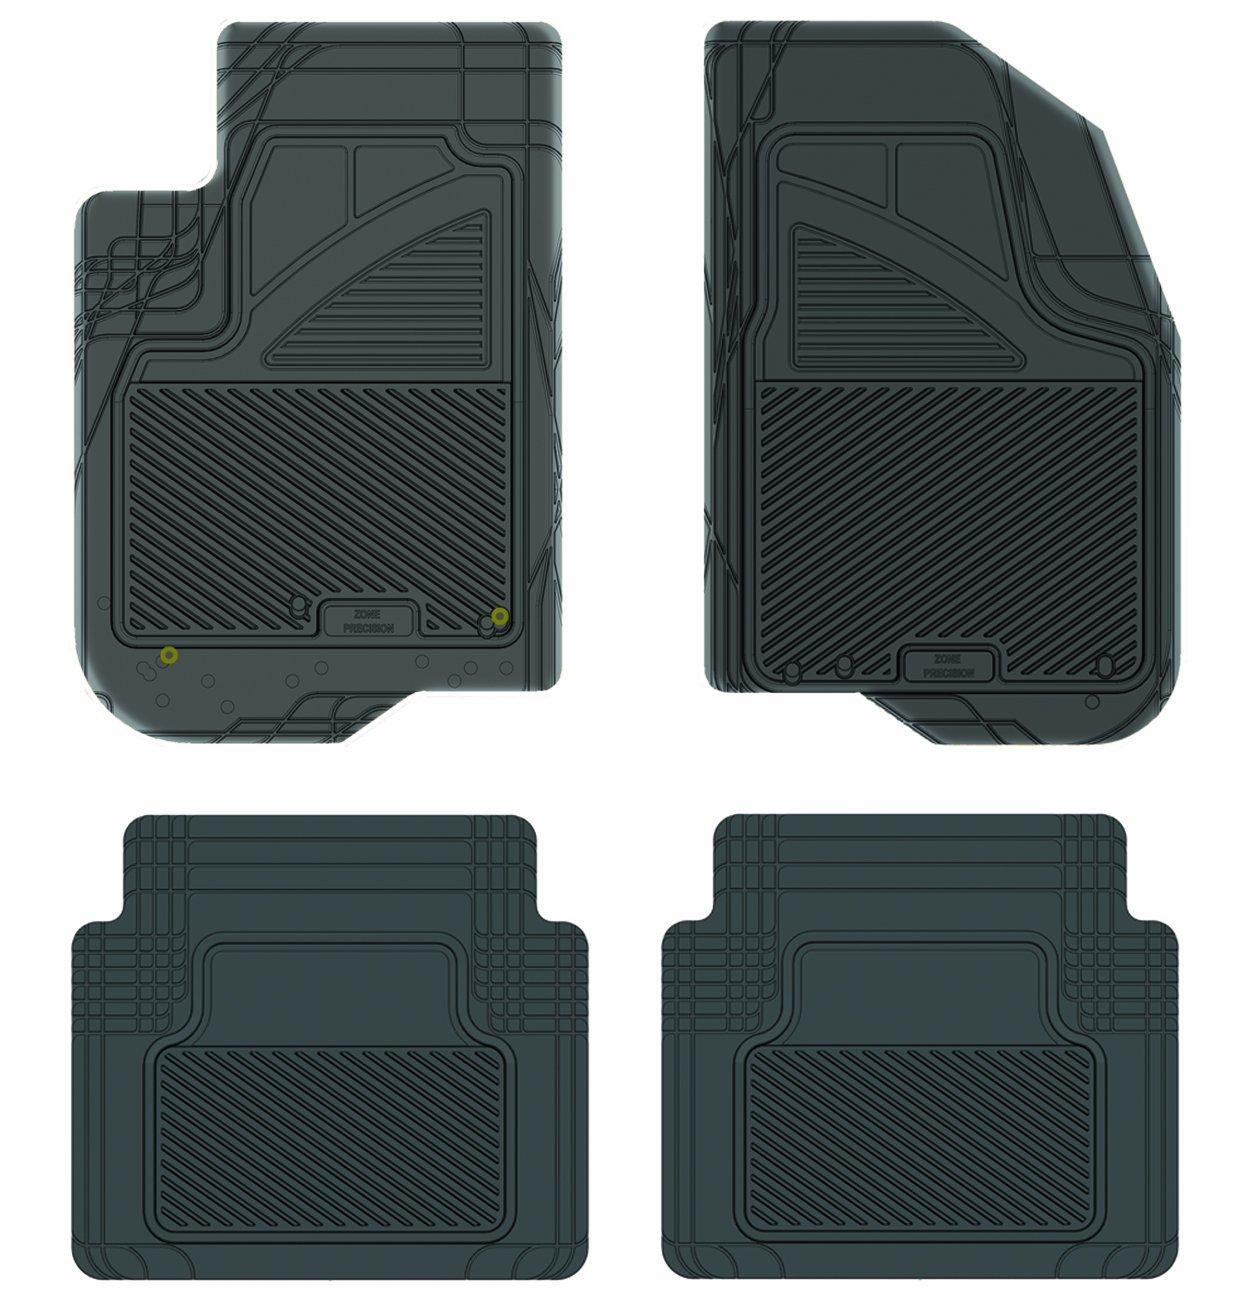 17214 Koolatron Pants Saver Custom Fit 4 Piece All Weather Car Mat for Select Pontiac G6 Models Black